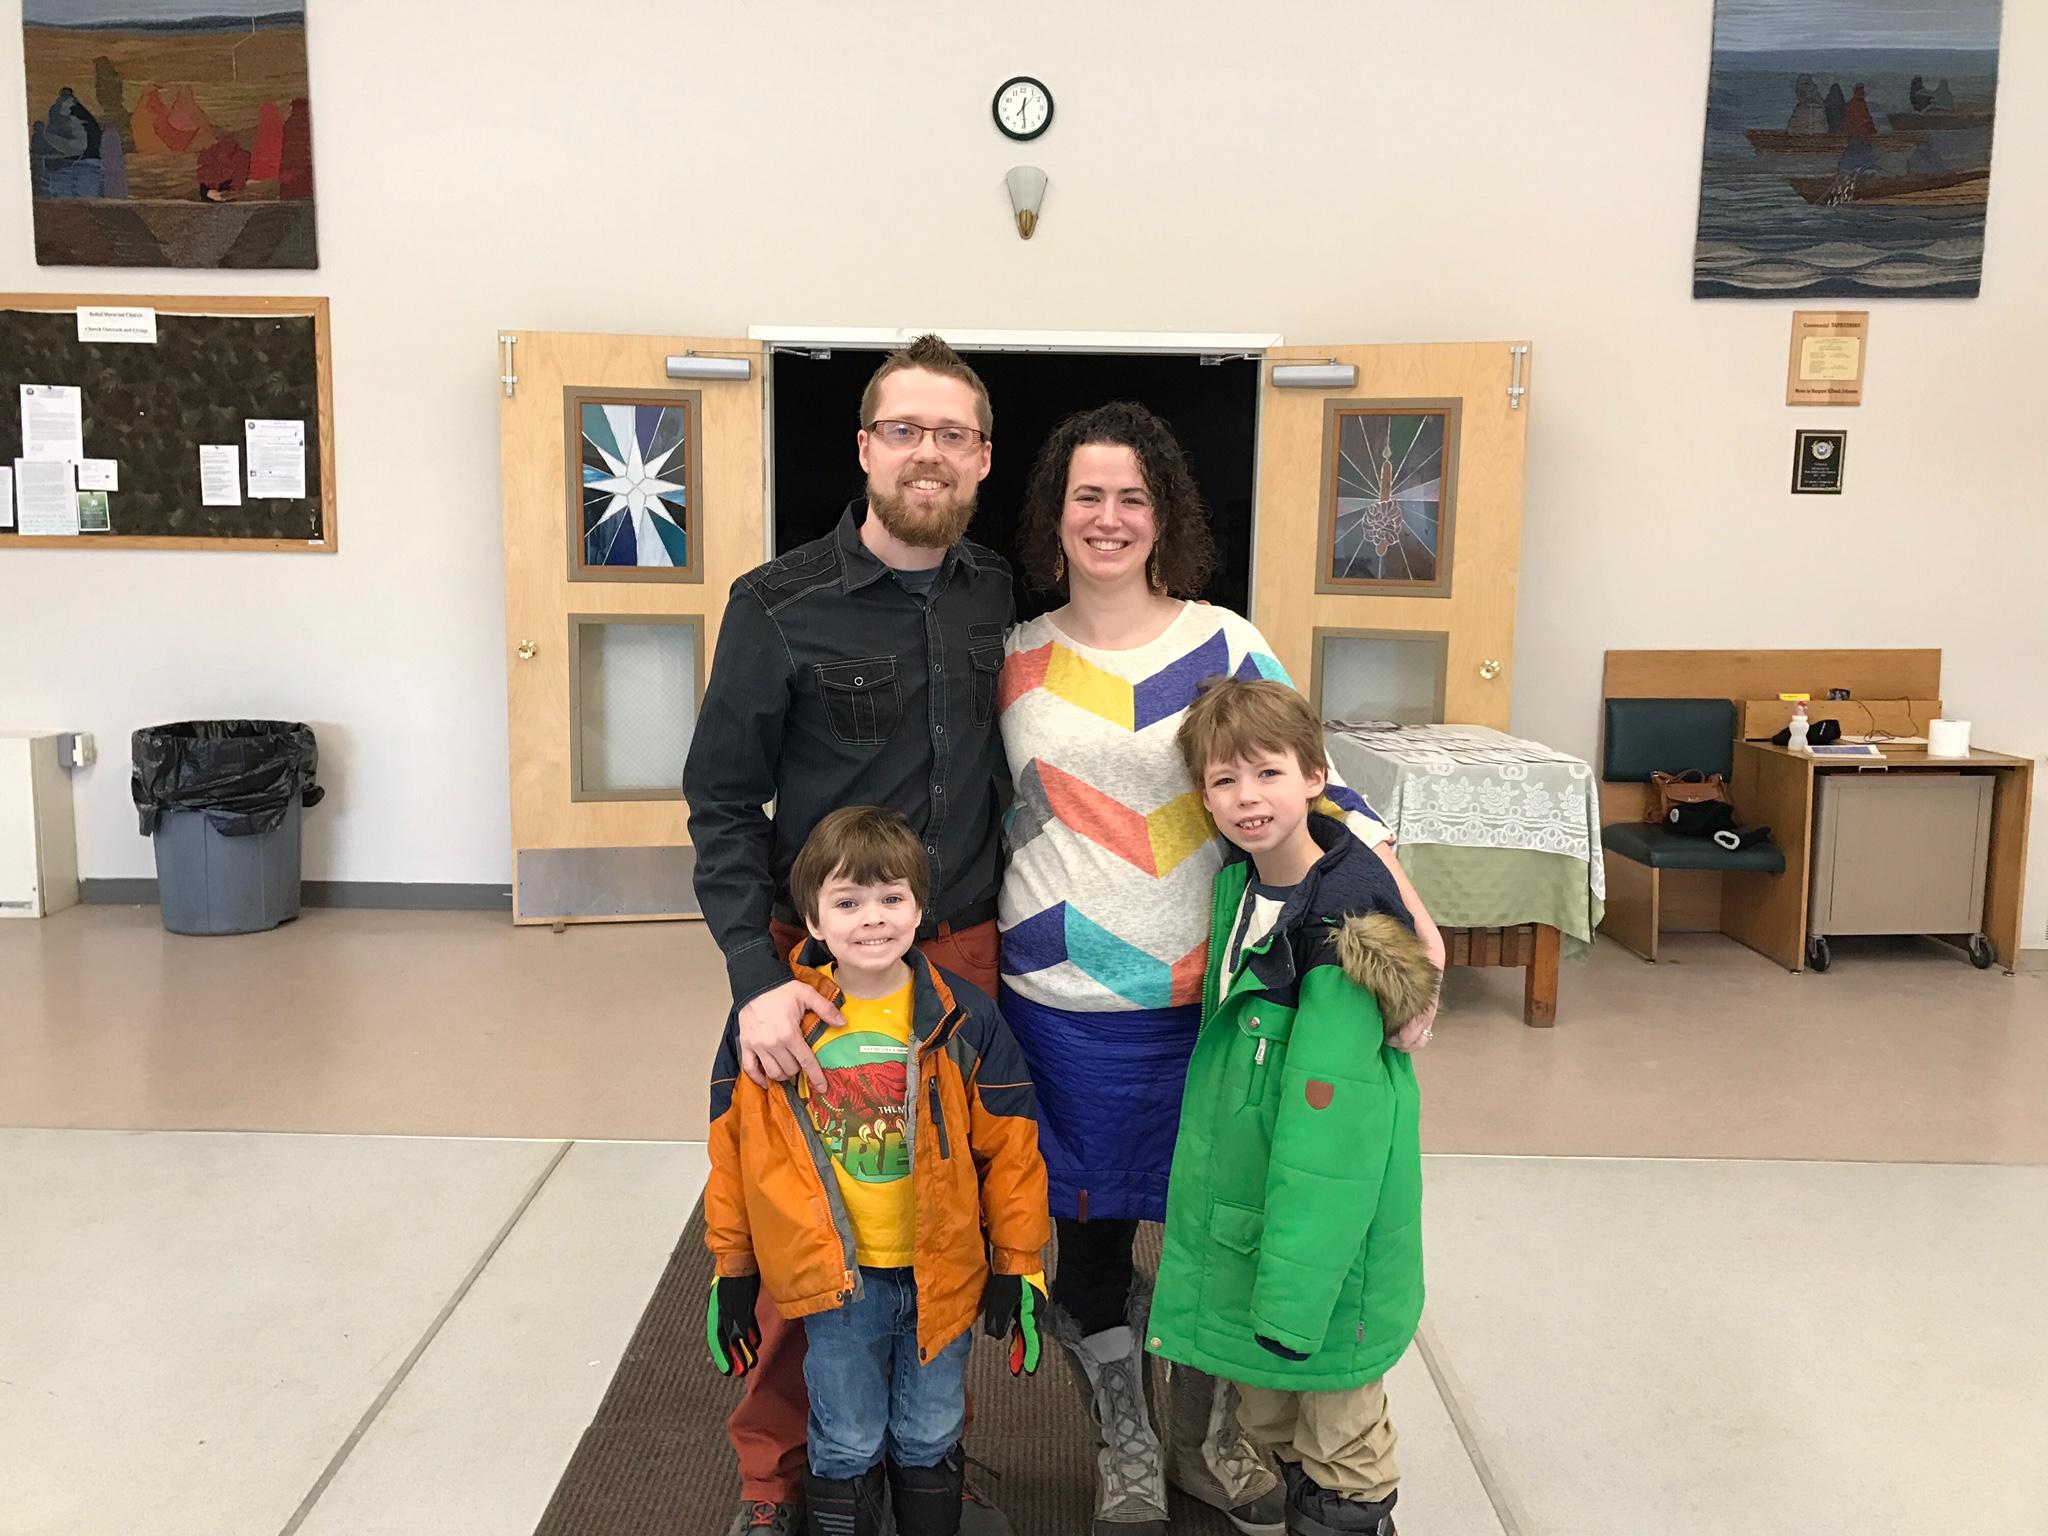 Sunday, February 19, 2017 at the Bethel Moravian Church